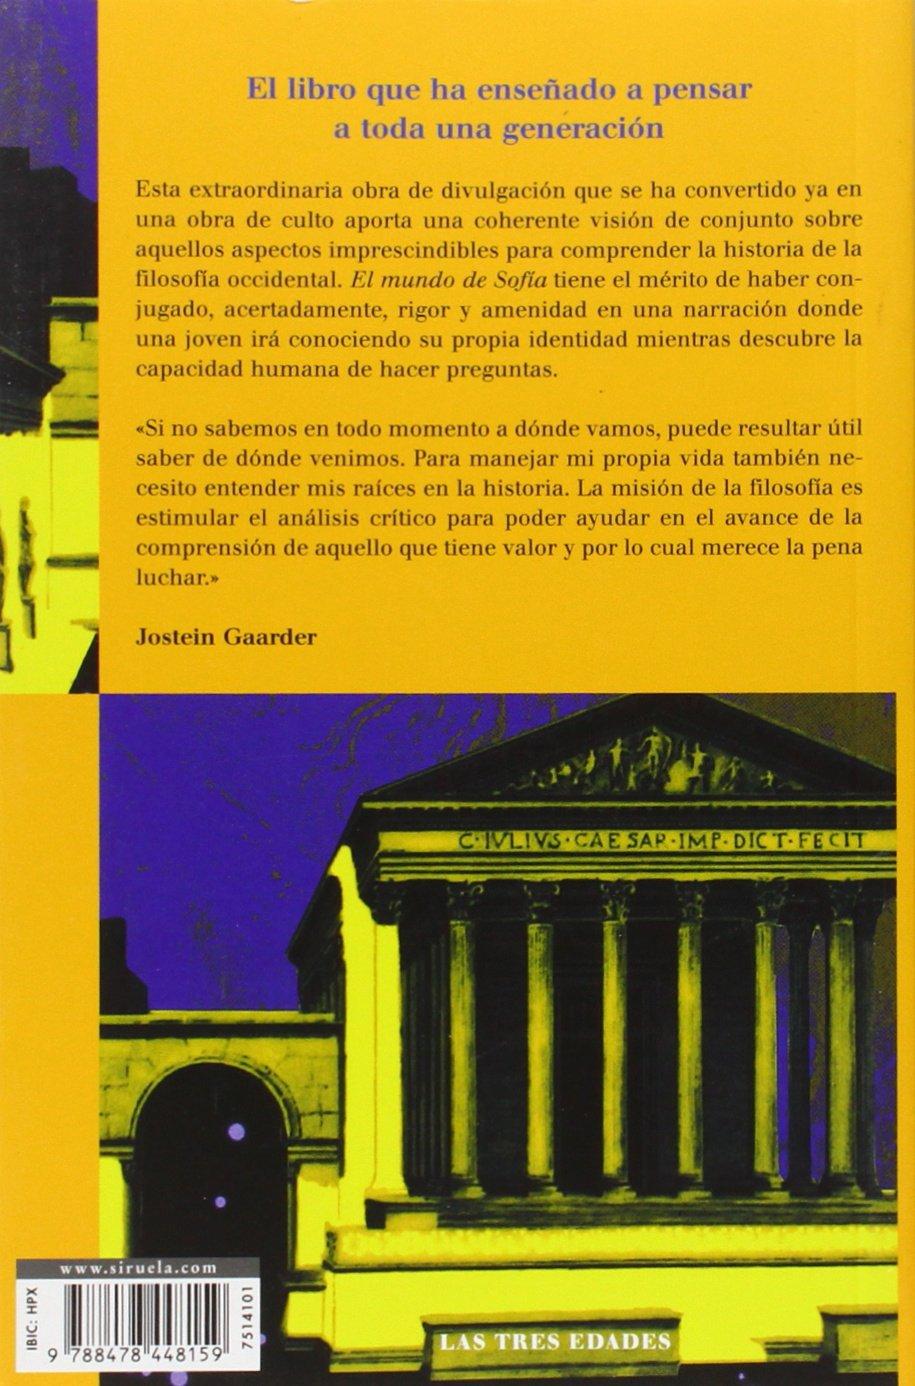 El mundo de Sofia (Biblioteca Gaarder) (Spanish Edition): Jostein Gaarder:  9788478448159: Amazon.com: Books